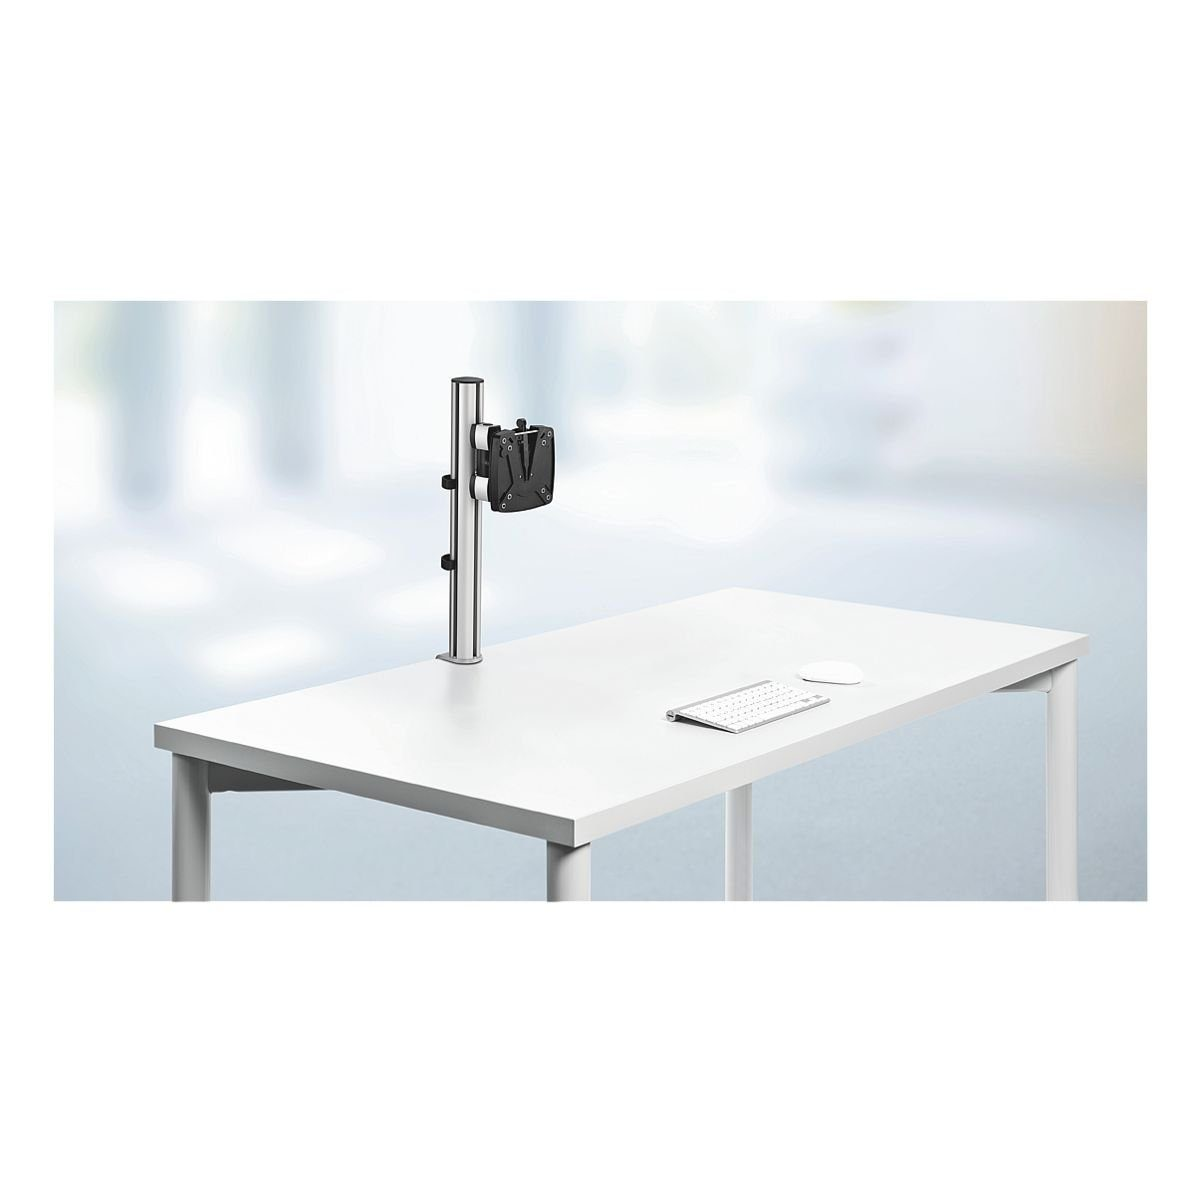 NOVUS Monitorhalter (220+0230) »NOVUS TSS SINGLE 105«